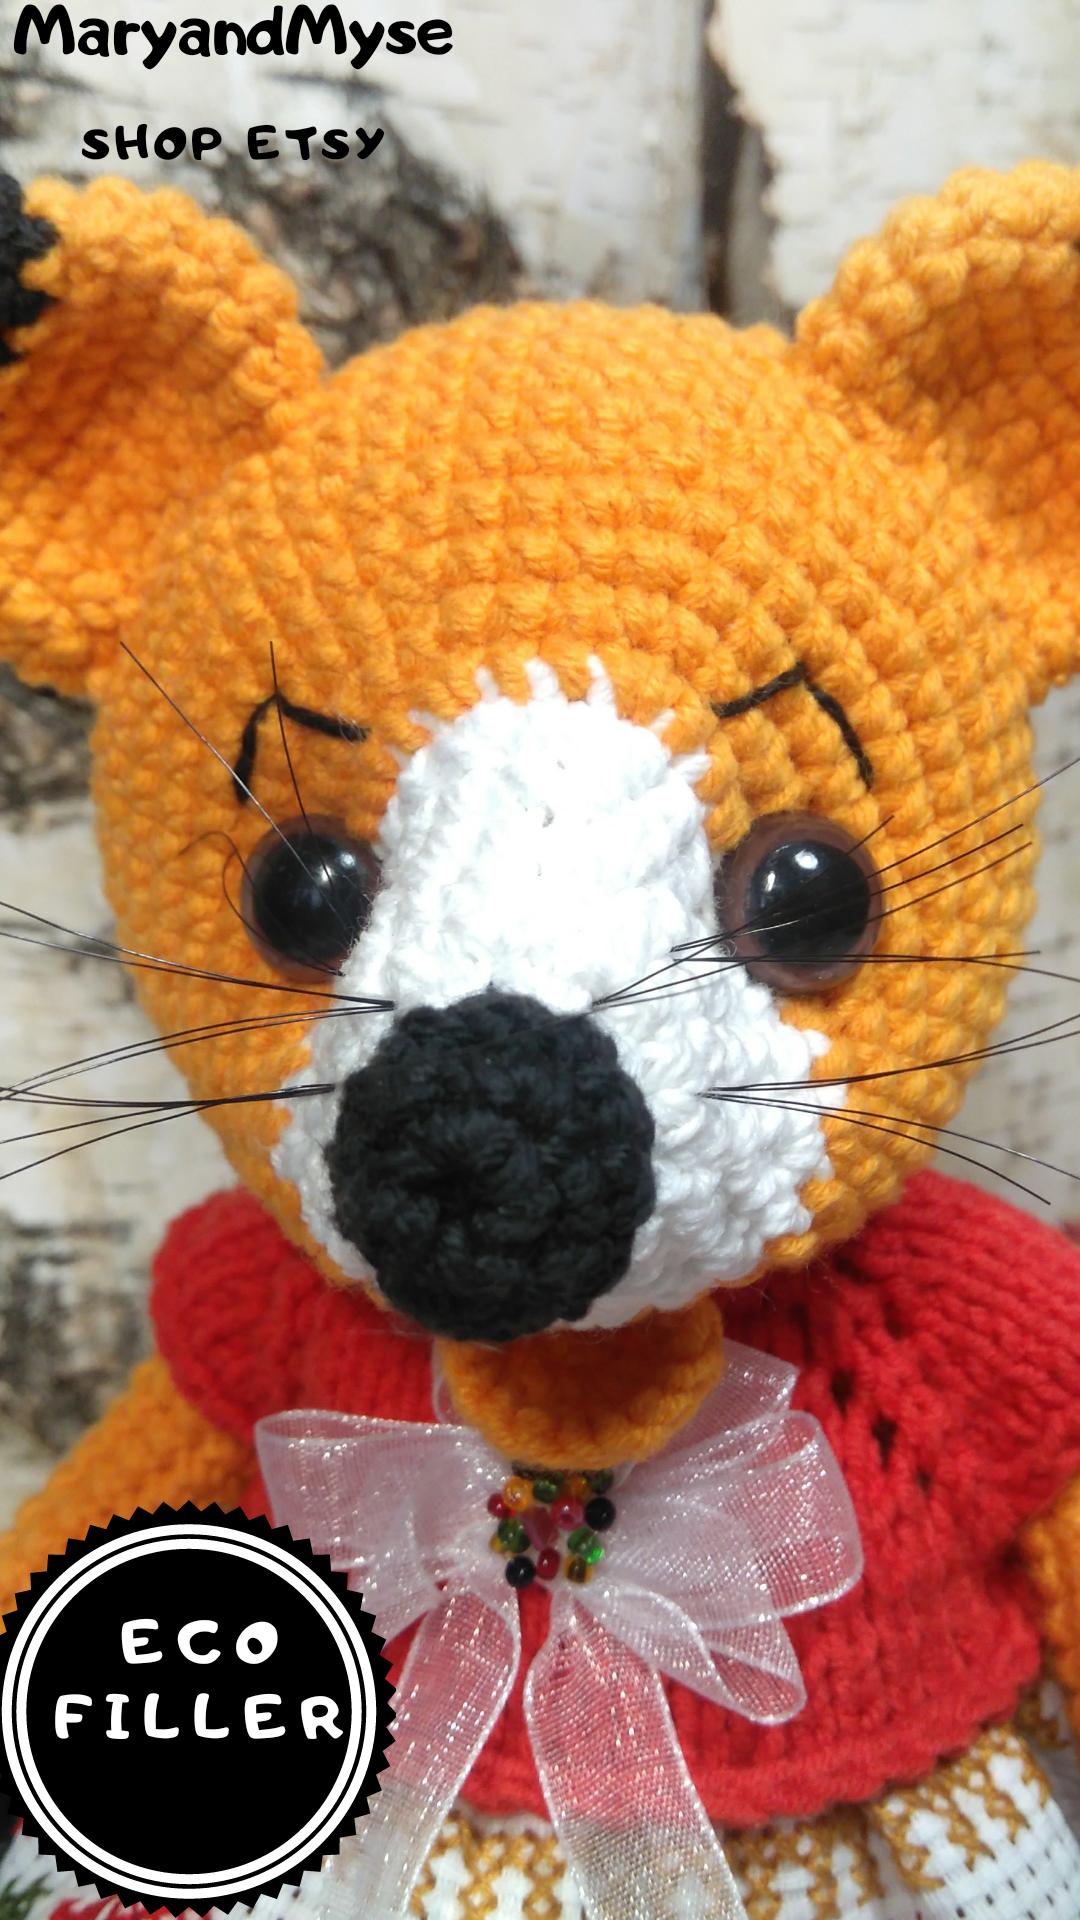 Cuddle Me Bear amigurumi pattern | Crochet teddy bear pattern ... | 1920x1080